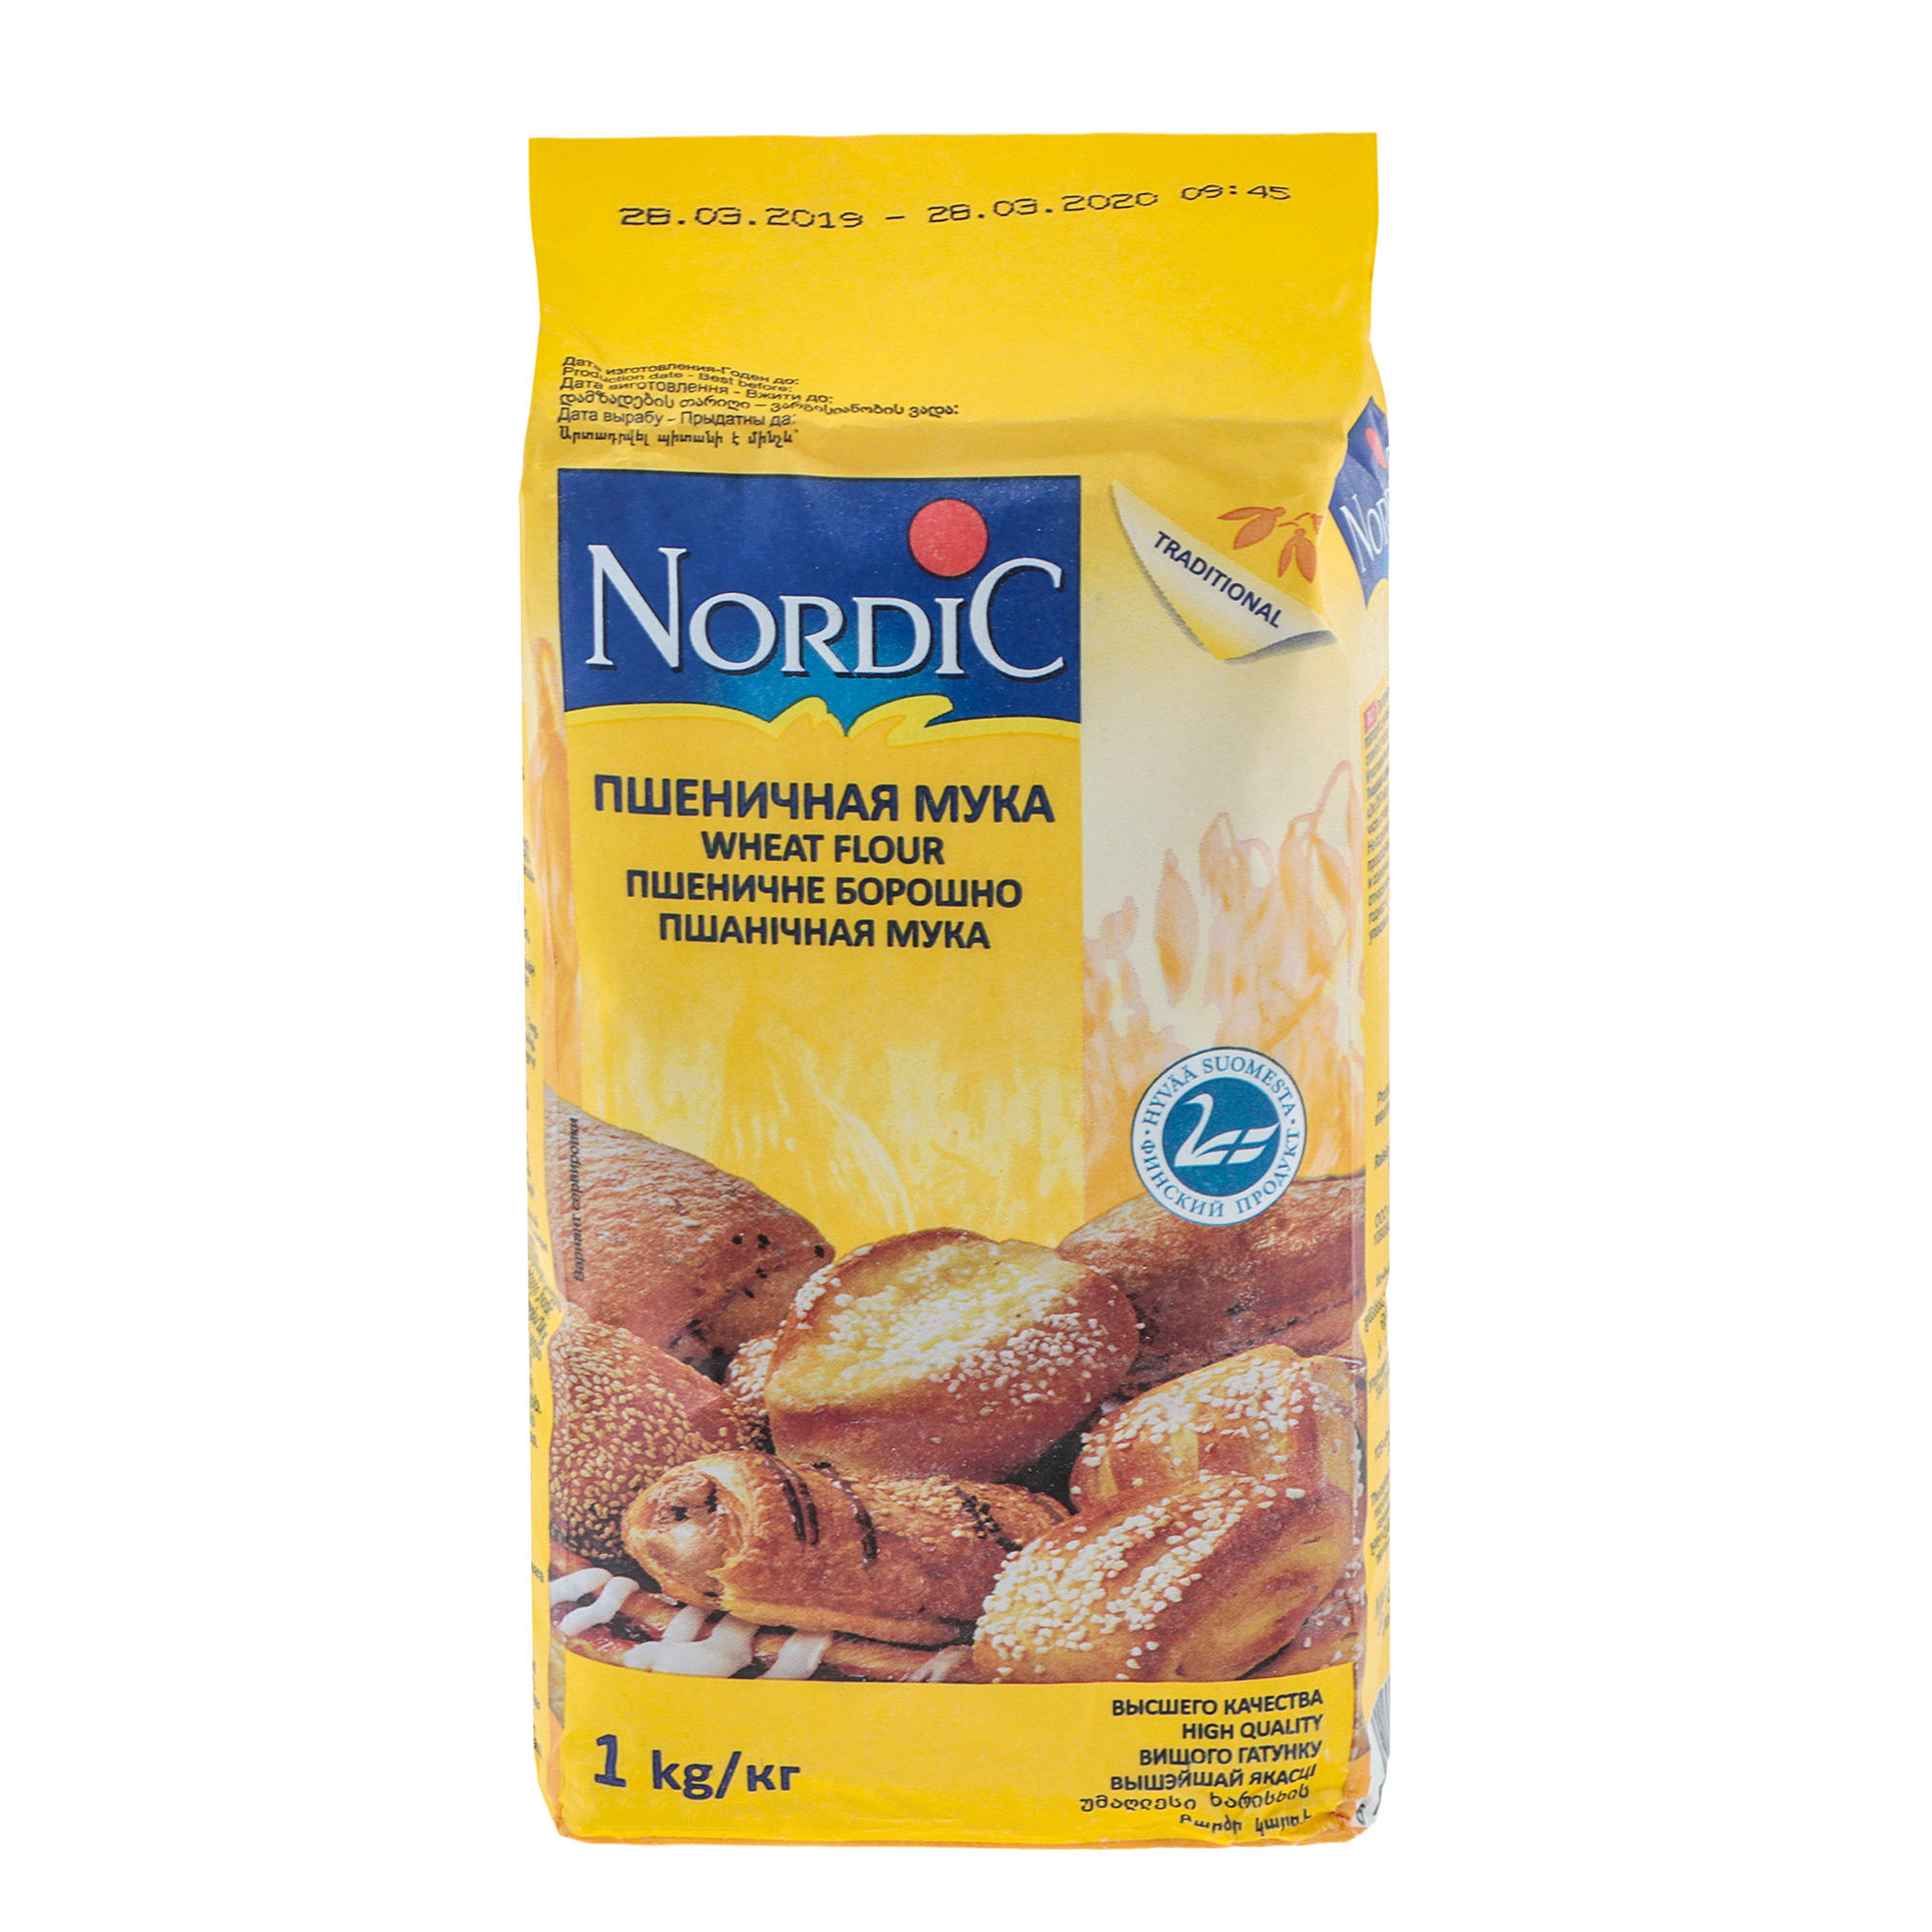 Мука пшеничная Nordic 1 кг